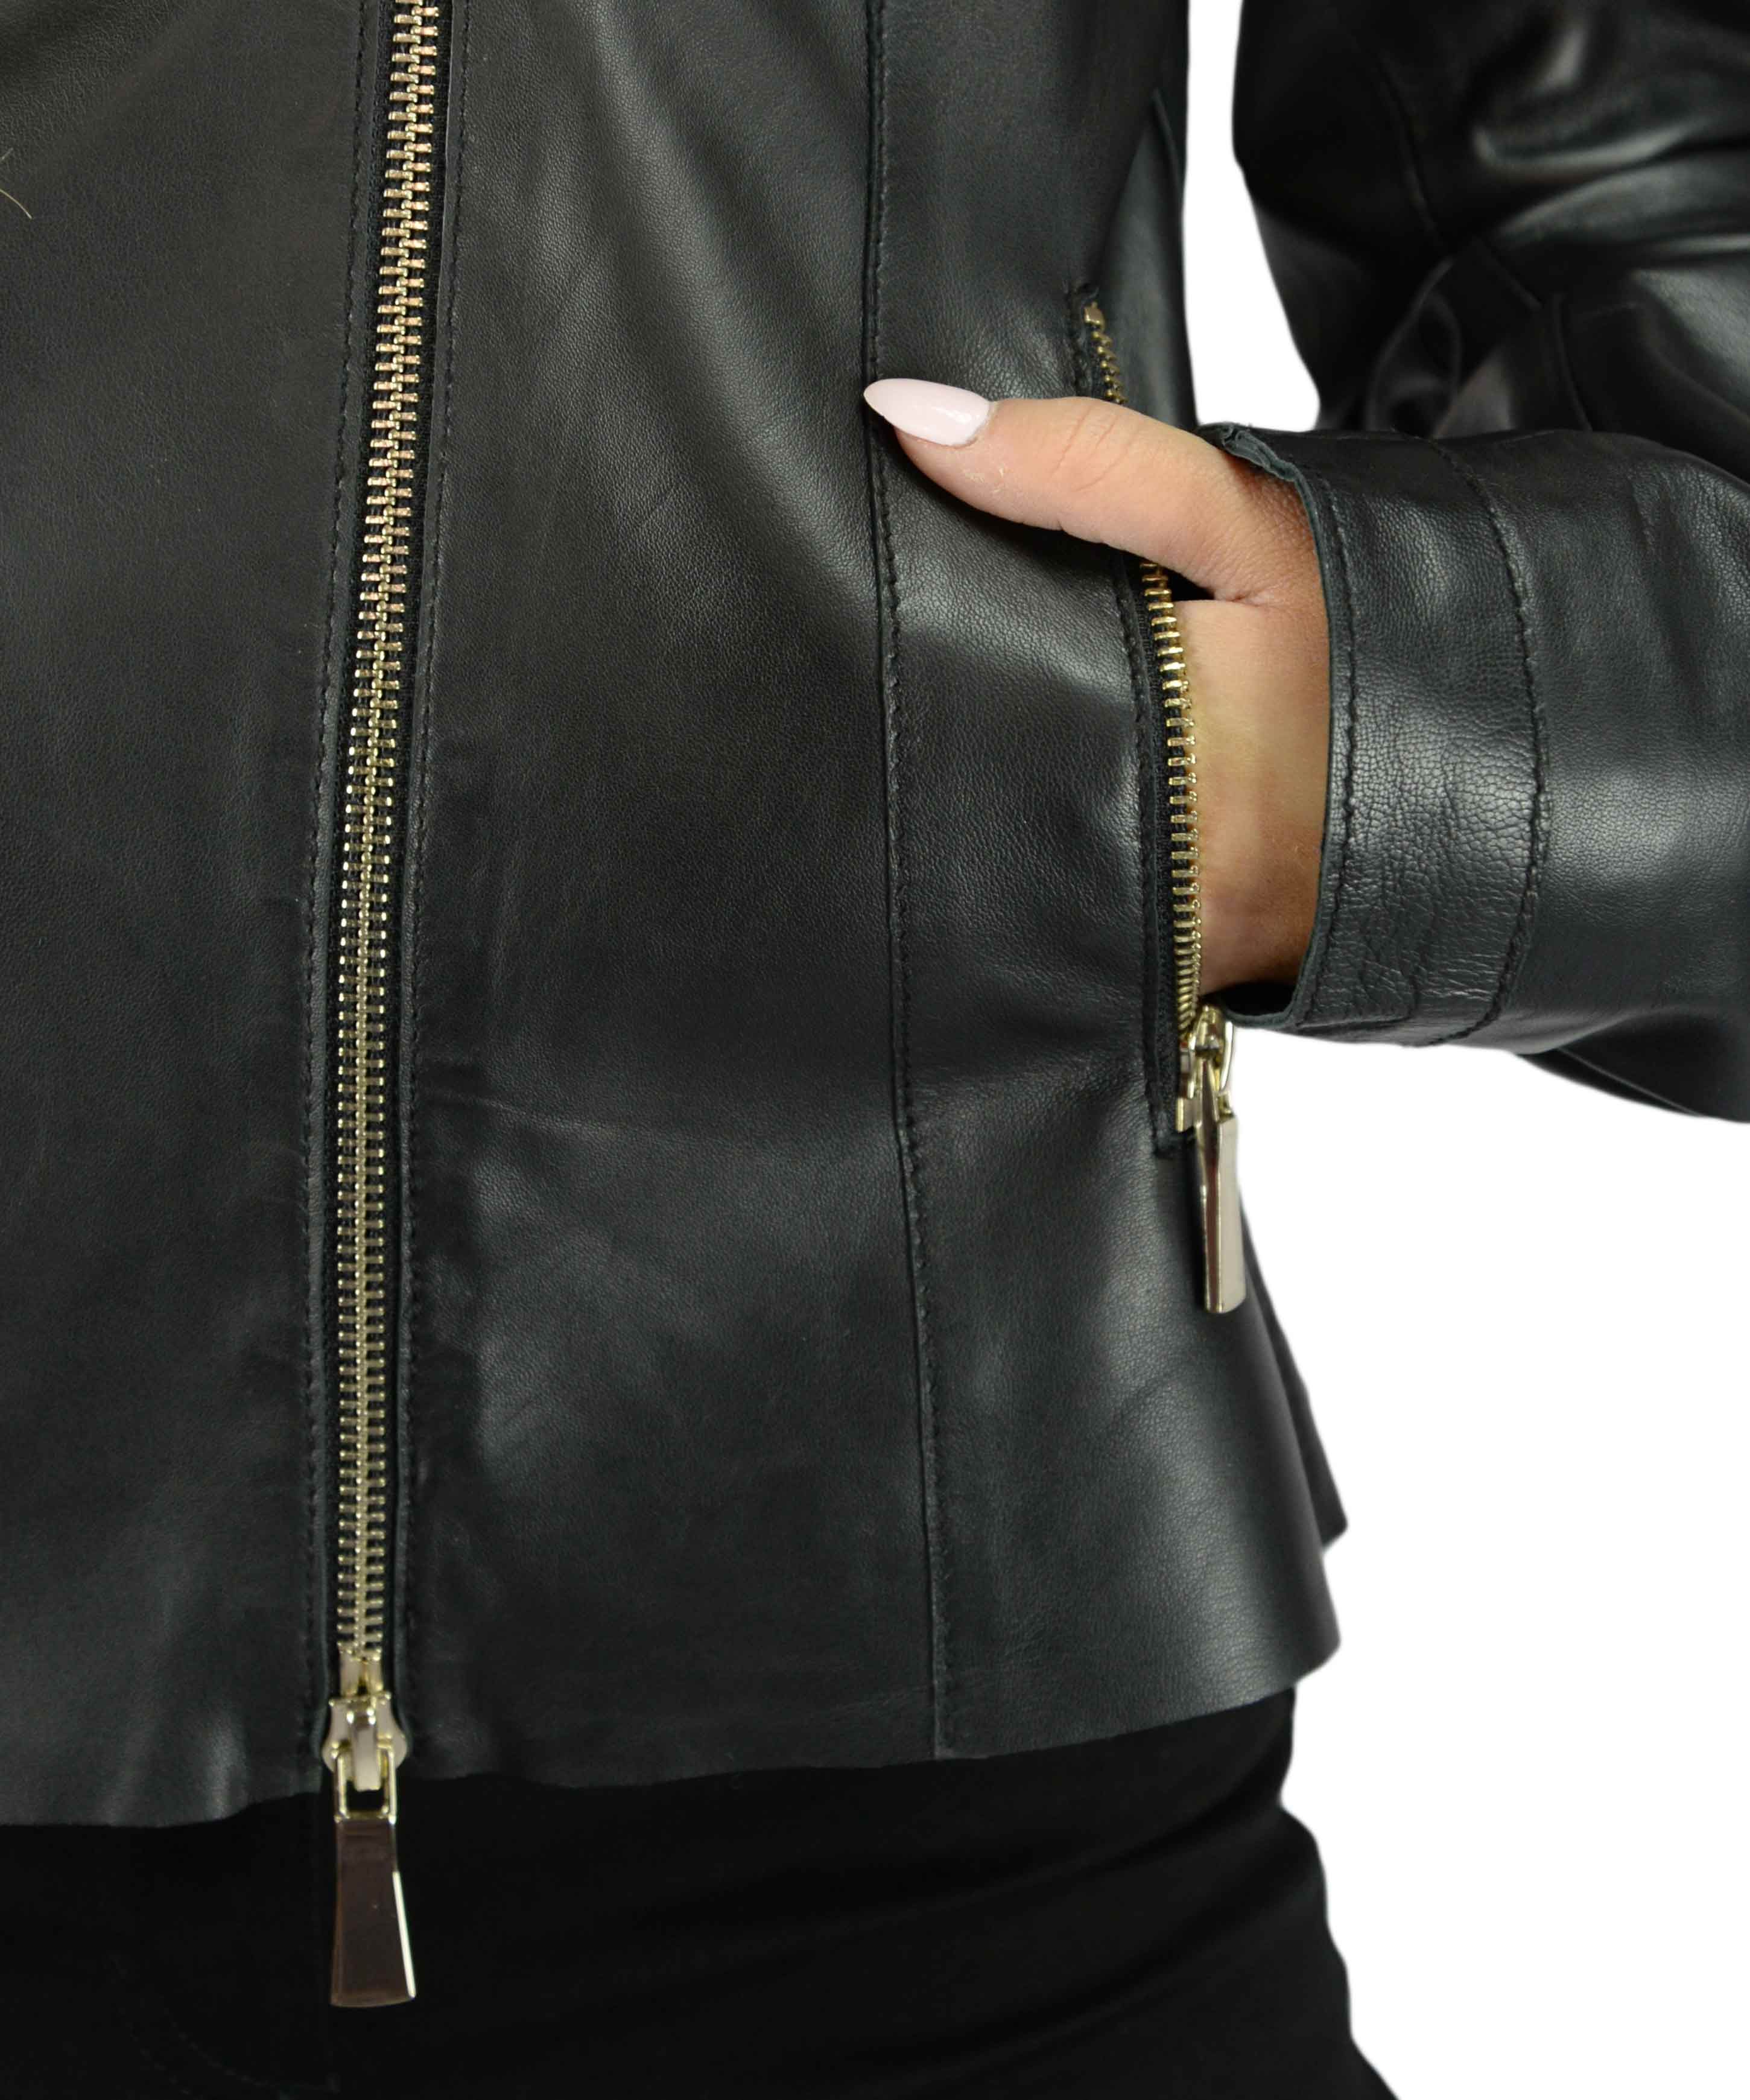 timeless design 41126 636db Giubbotto in pelle nero donna iBlues